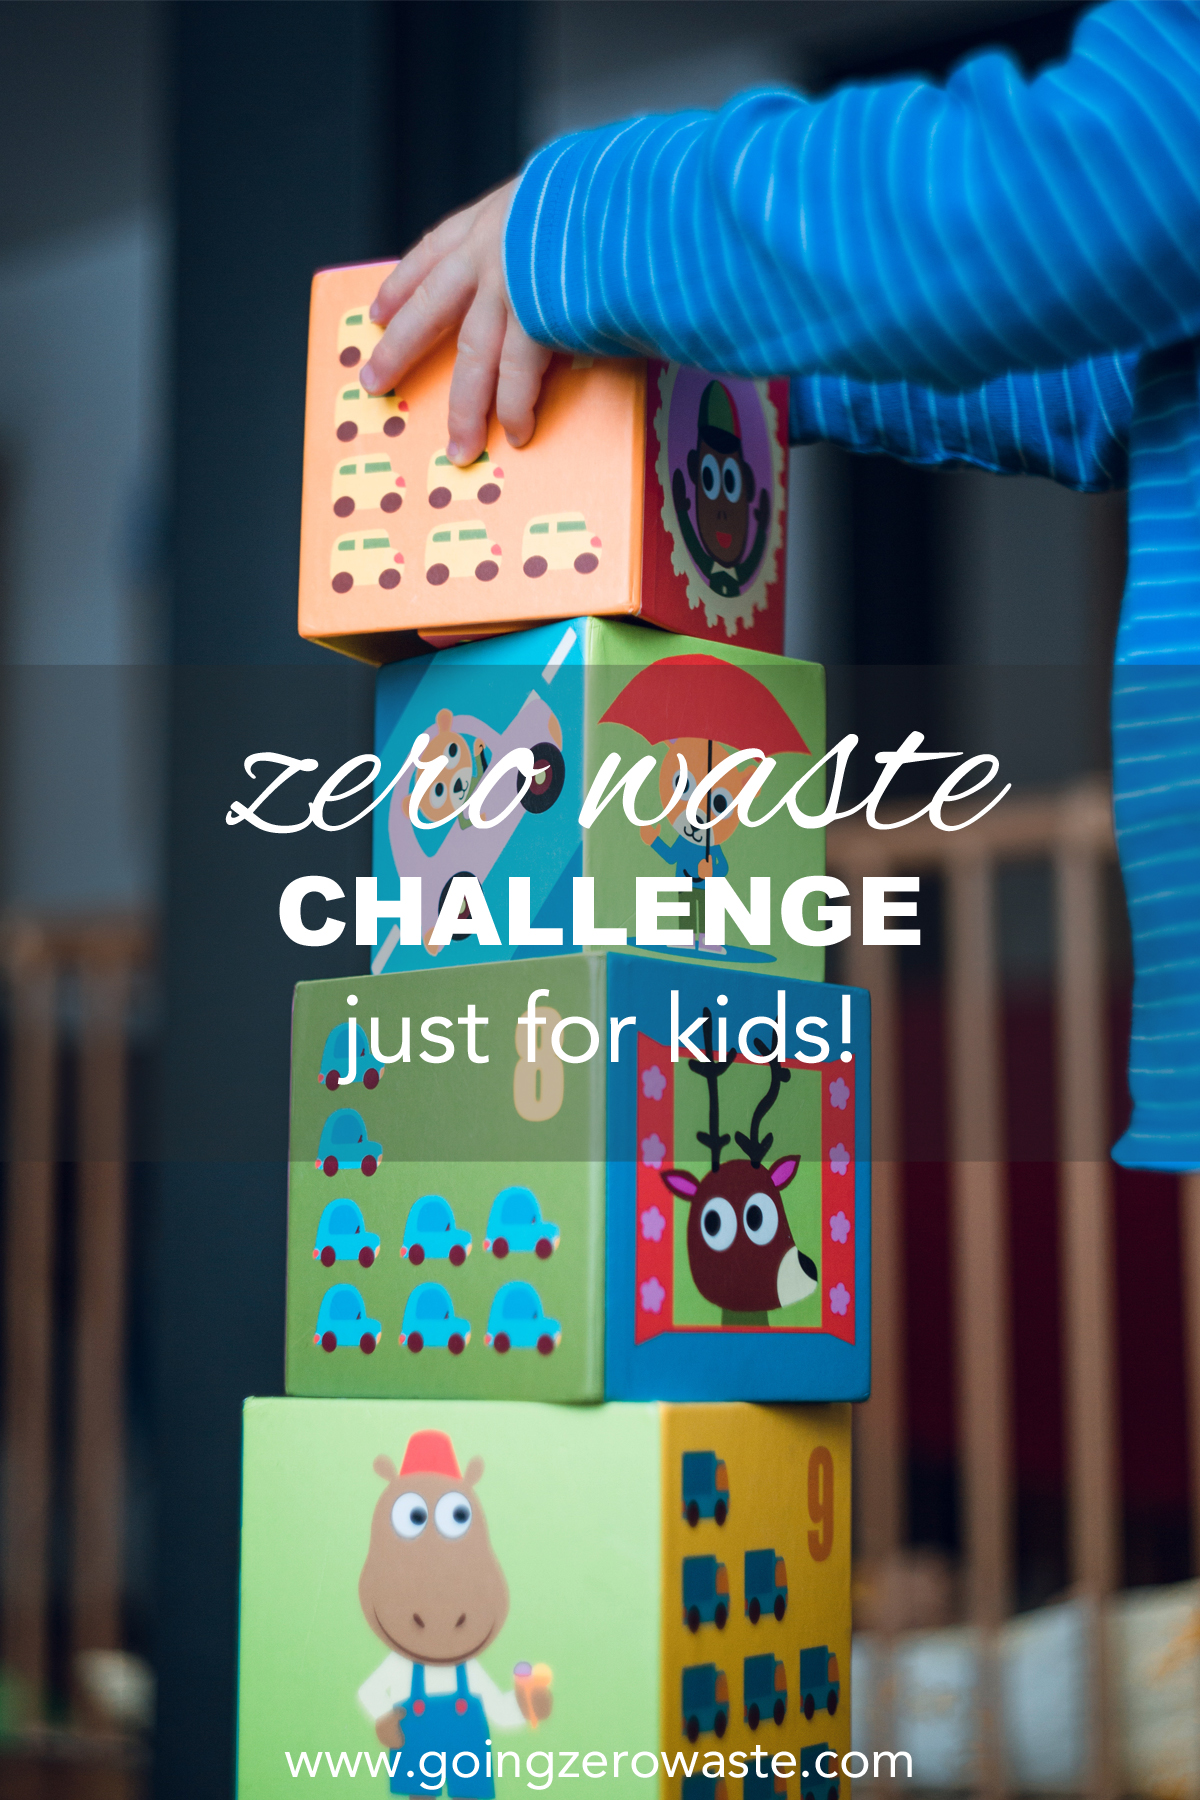 The zero waste challenge just for kids! from www.goingzerowaste.com #zerowaste #ecofriendly #gogreen #simpleliving